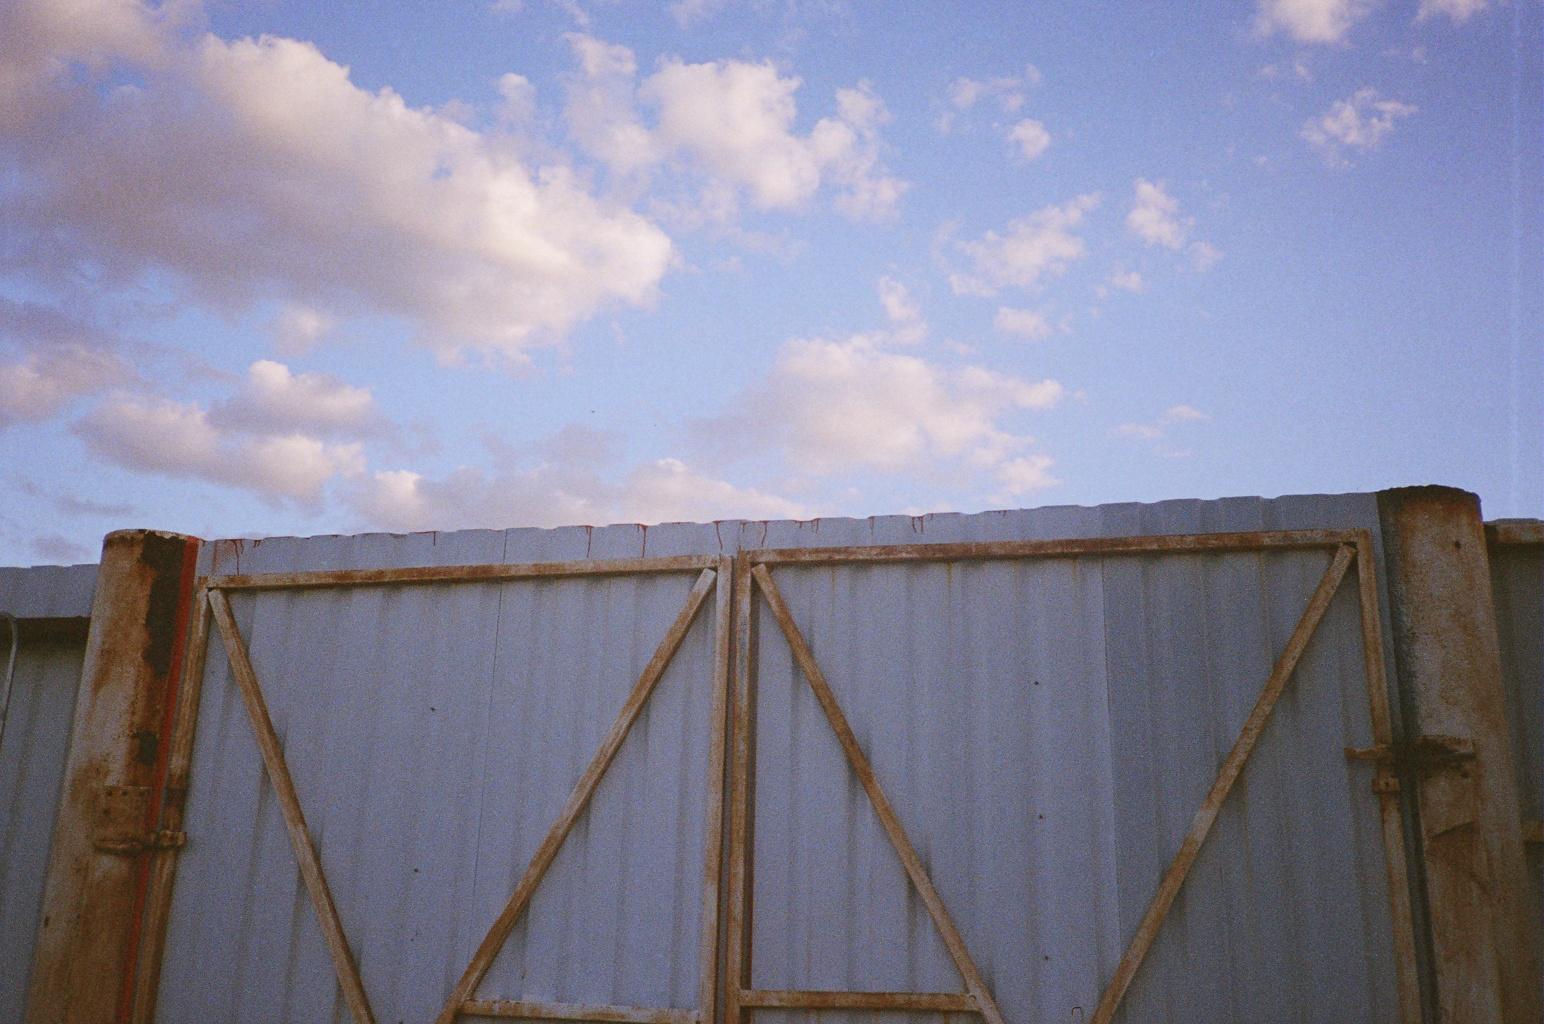 SHARKIVE_20100923.jpg